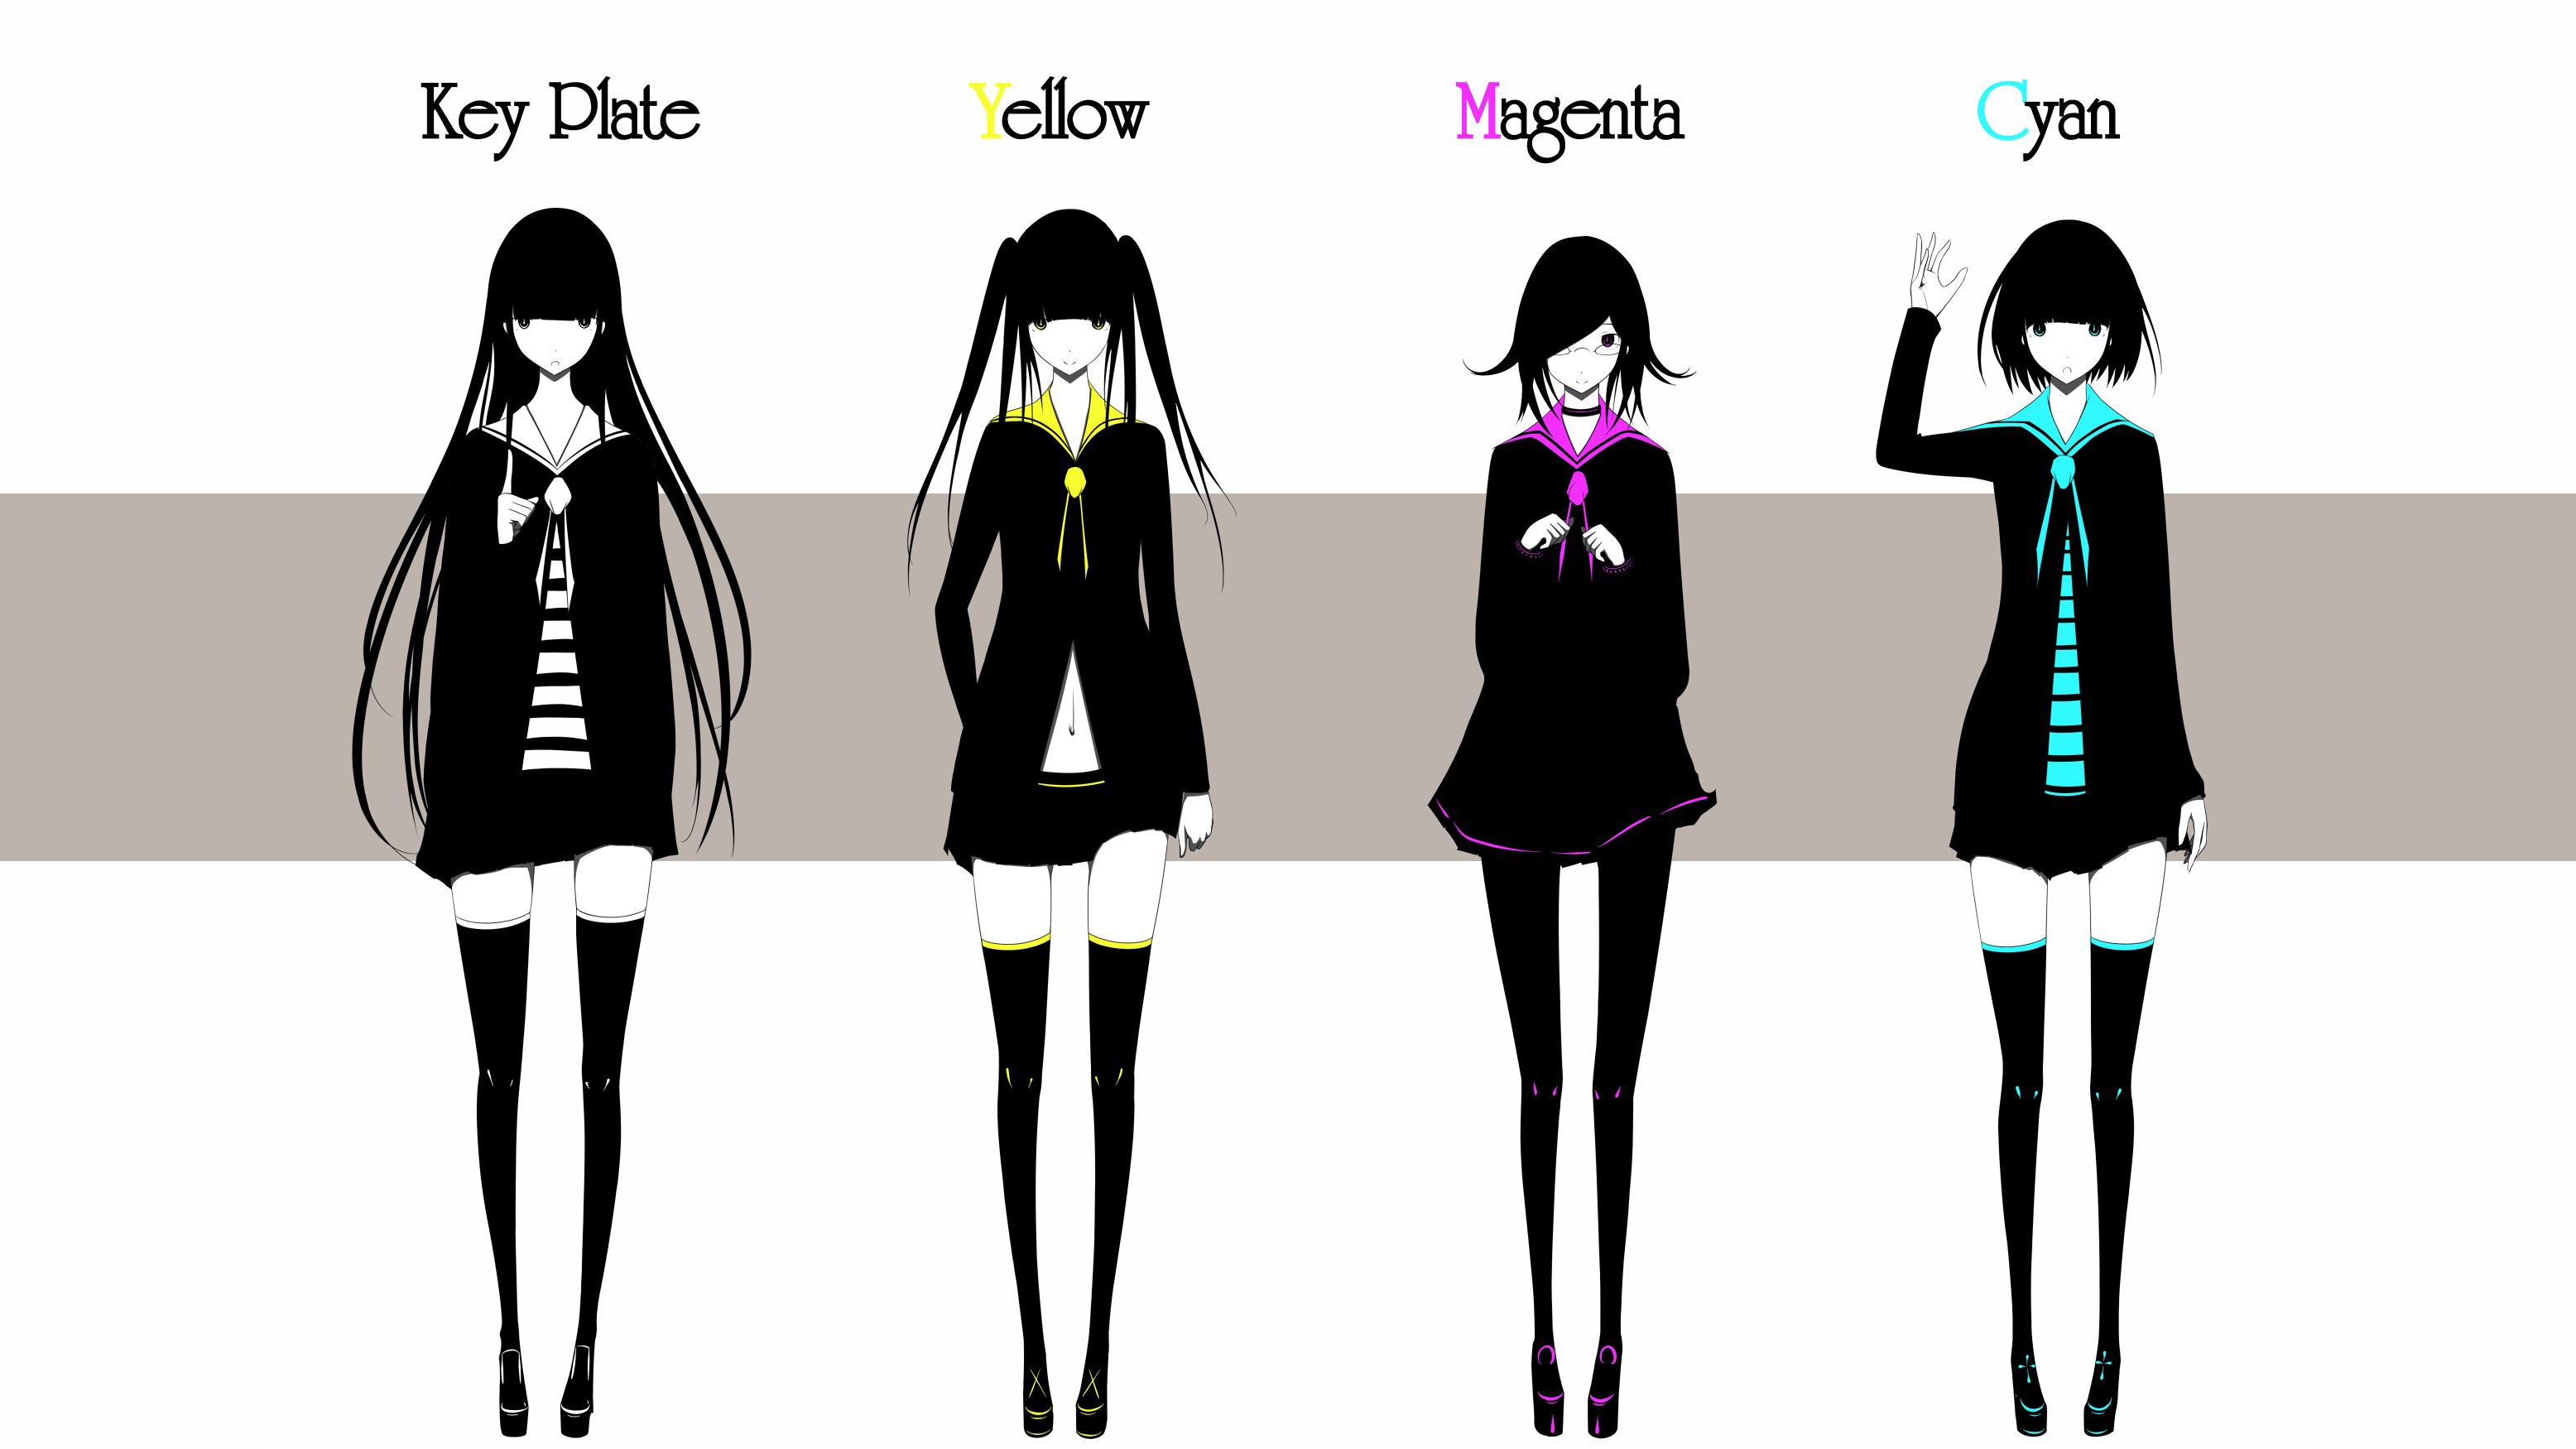 Fondos De Pantalla Email Protected Chicas Anime